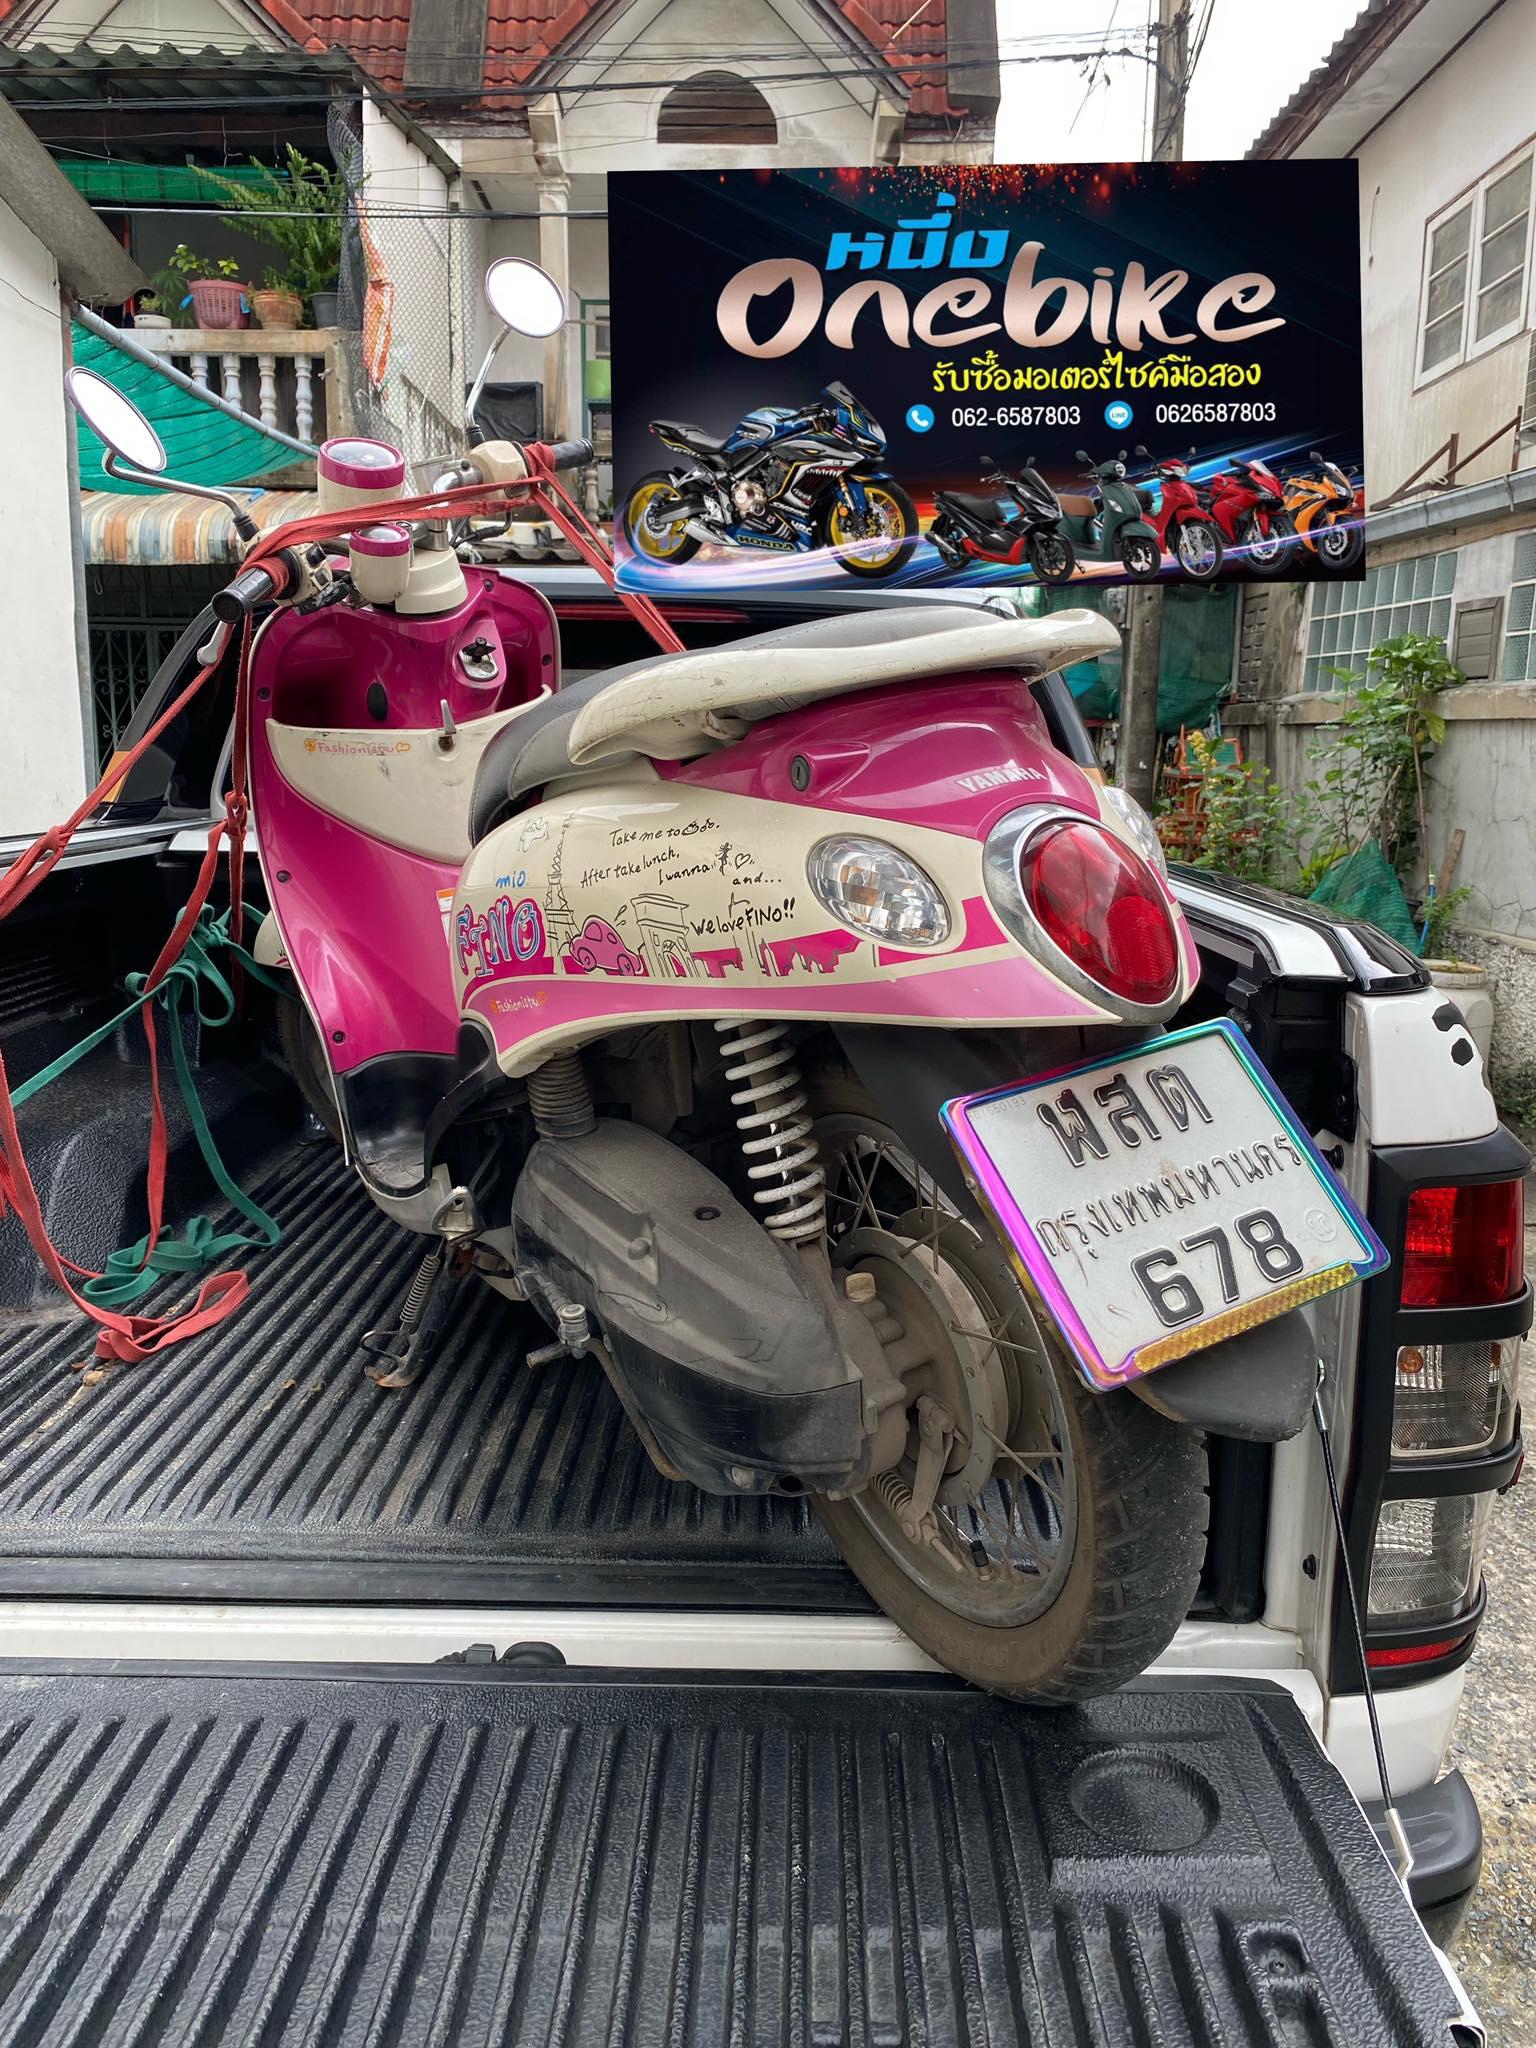 ONEBIKE รับซื้อรถมอเตอร์ไซค์ลาดพร้าว